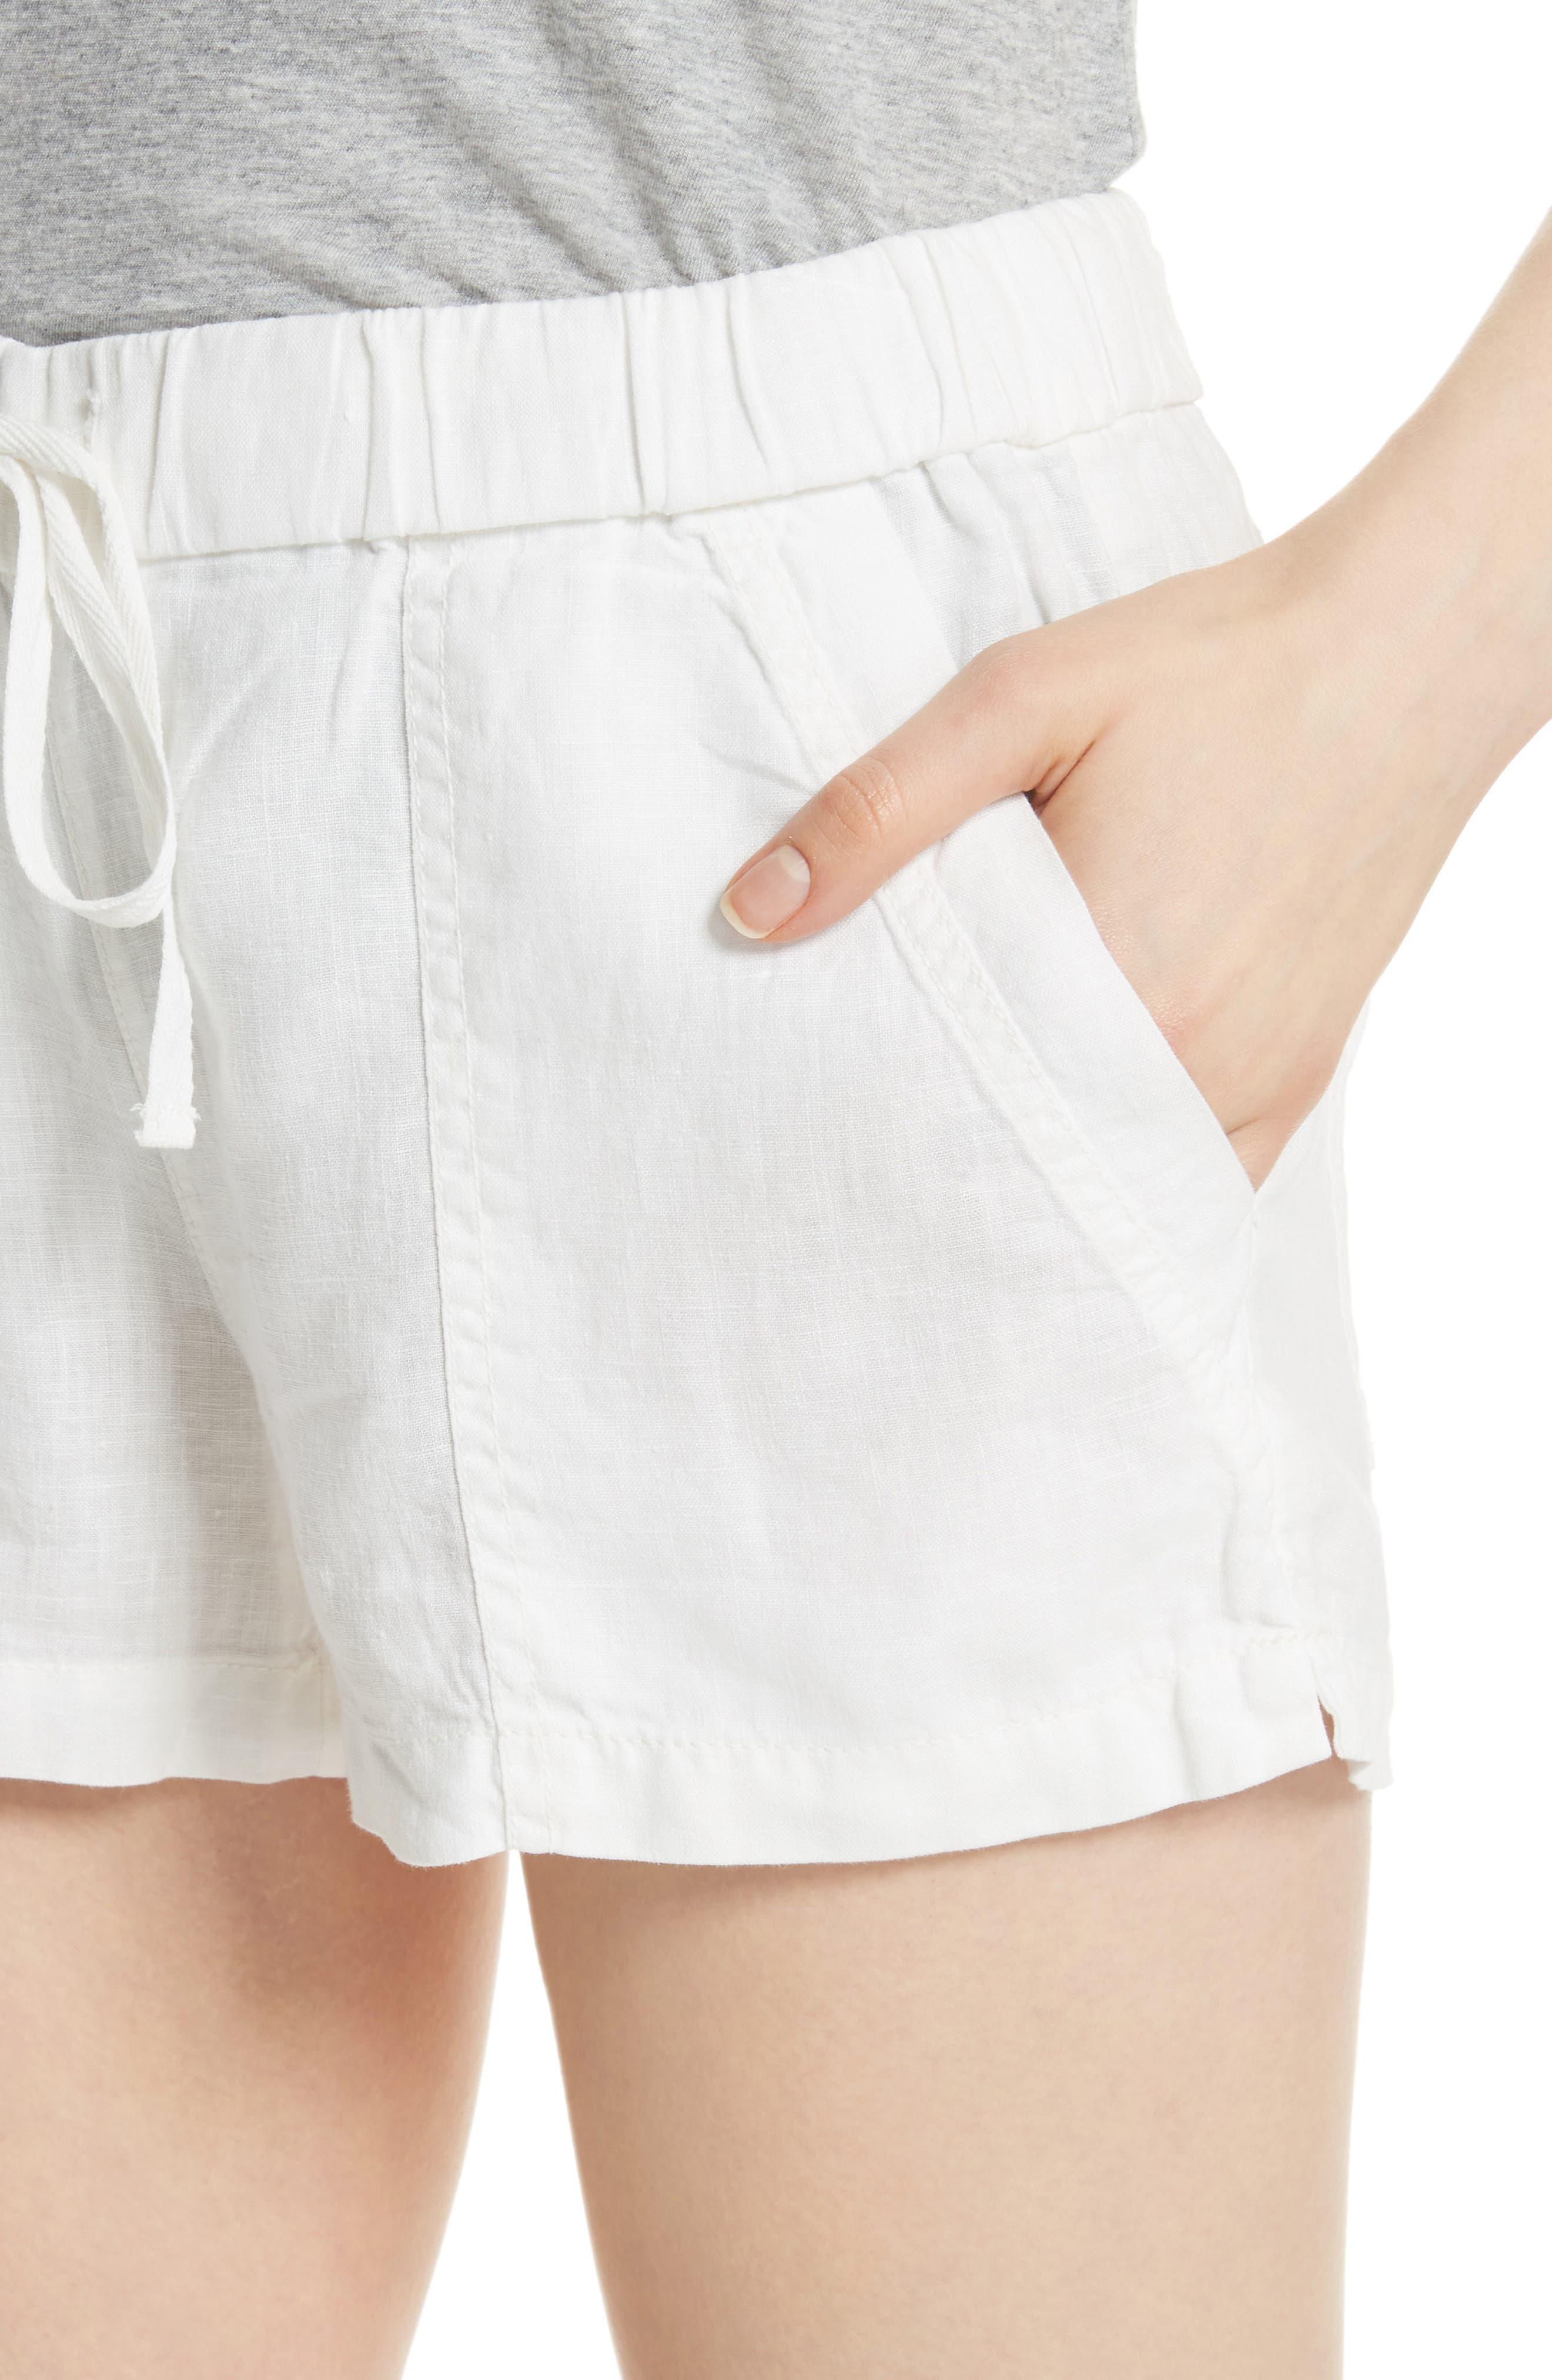 Fosette Linen Drawstring Shorts,                             Alternate thumbnail 4, color,                             Porcelain